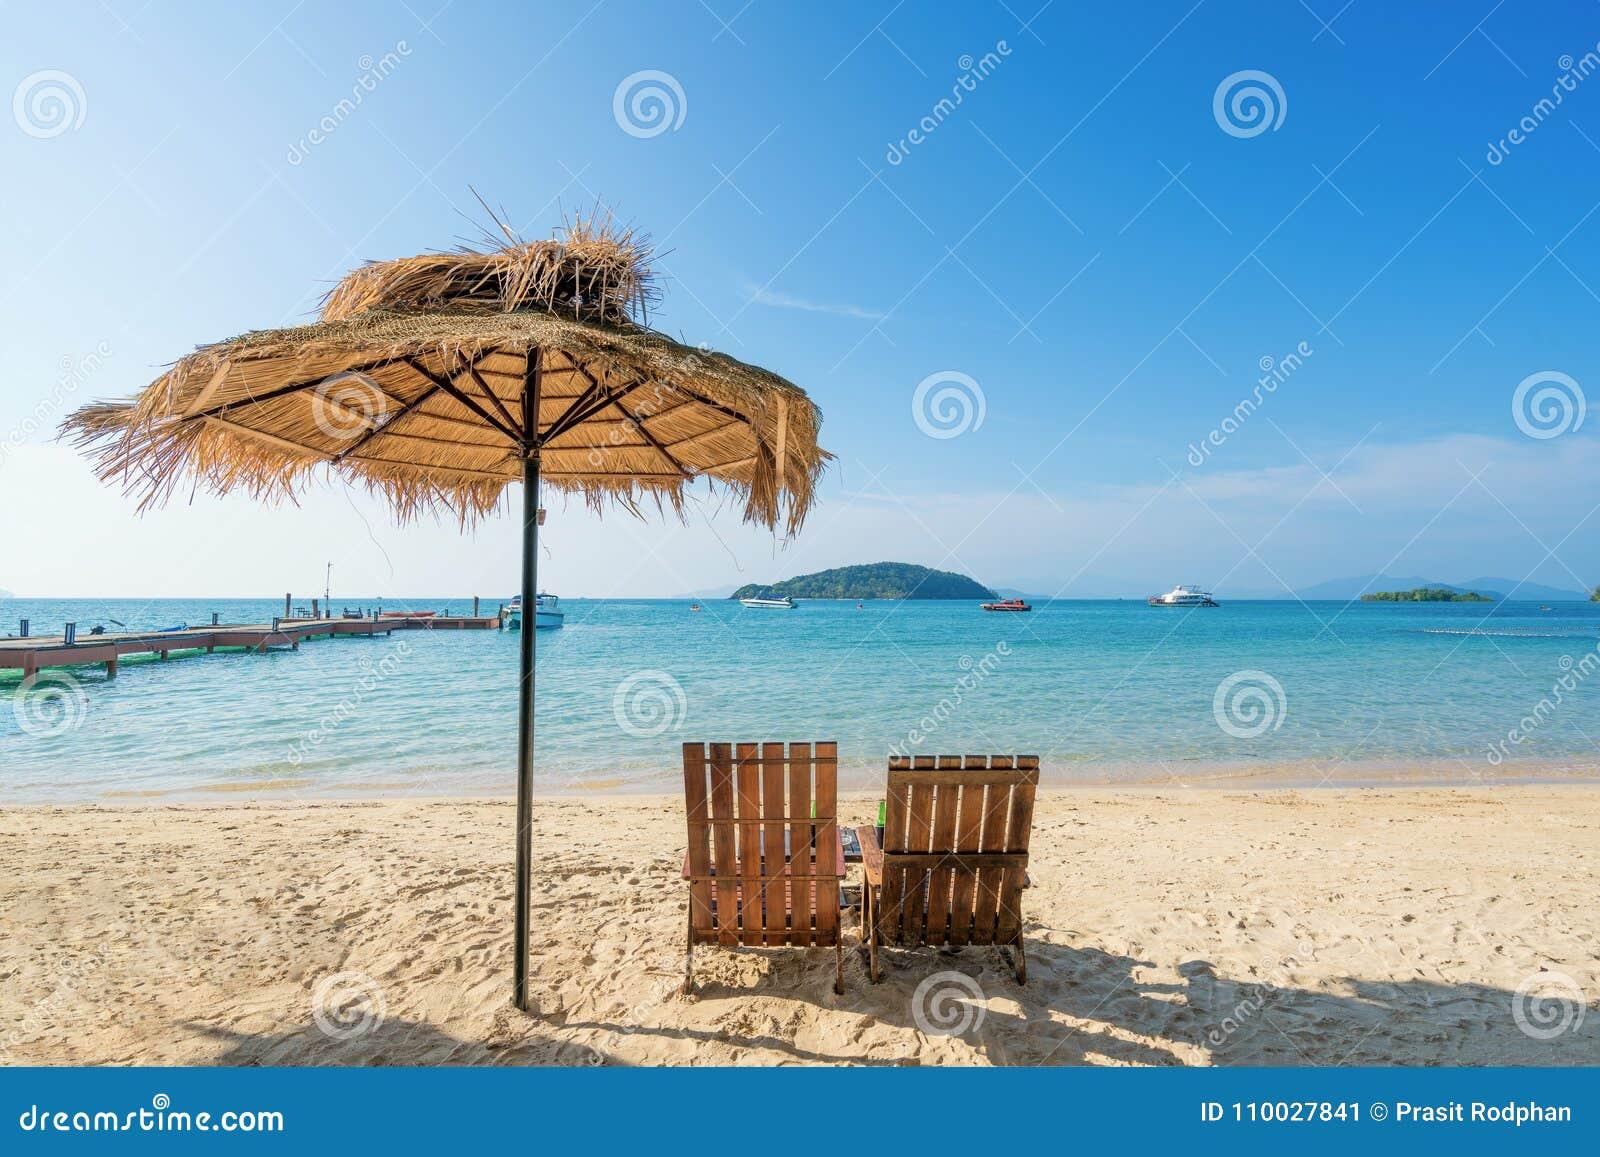 Ligstoelen en Paraplu op de zomereiland in Phuket, Thailand